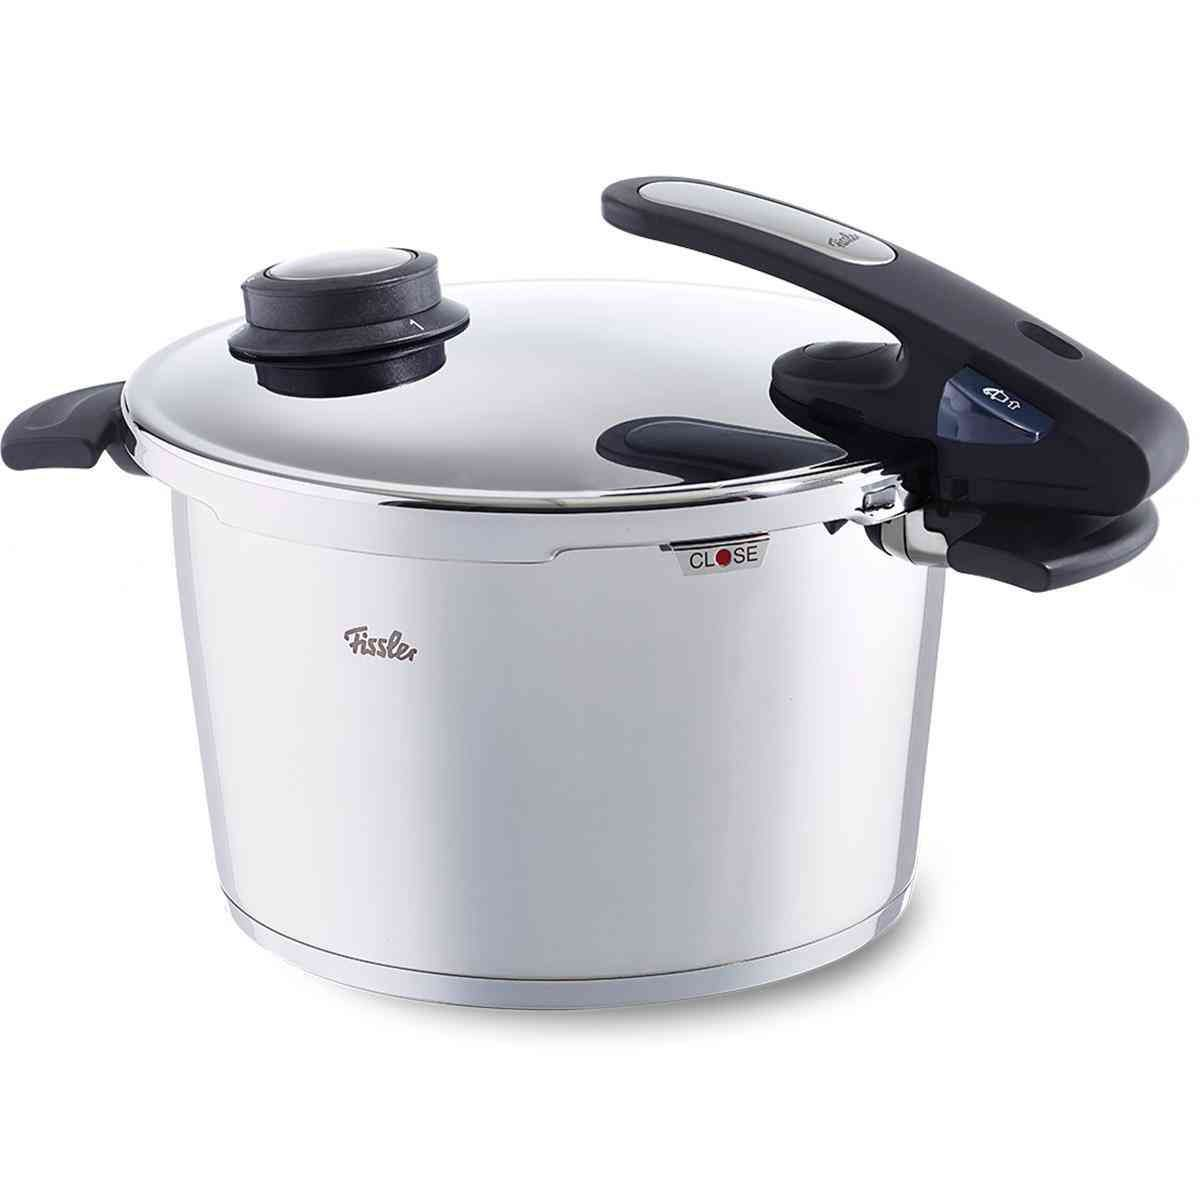 vitavit edition design pressure cooker 26 cm / 8 ltr. with inset